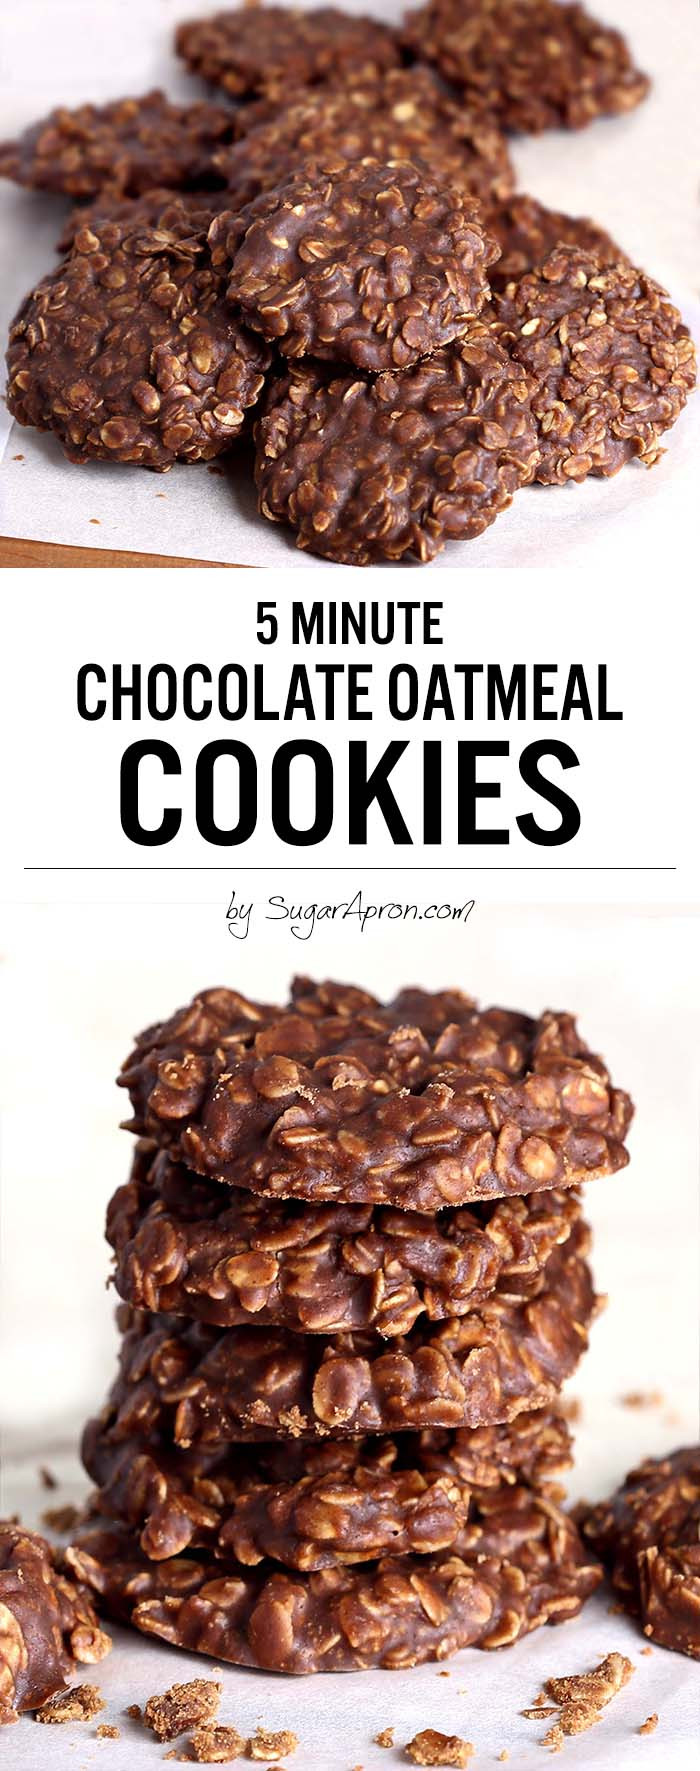 Chocolate Oatmeal Cookies  No Bake Chocolate Oatmeal Cookies Sugar Apron